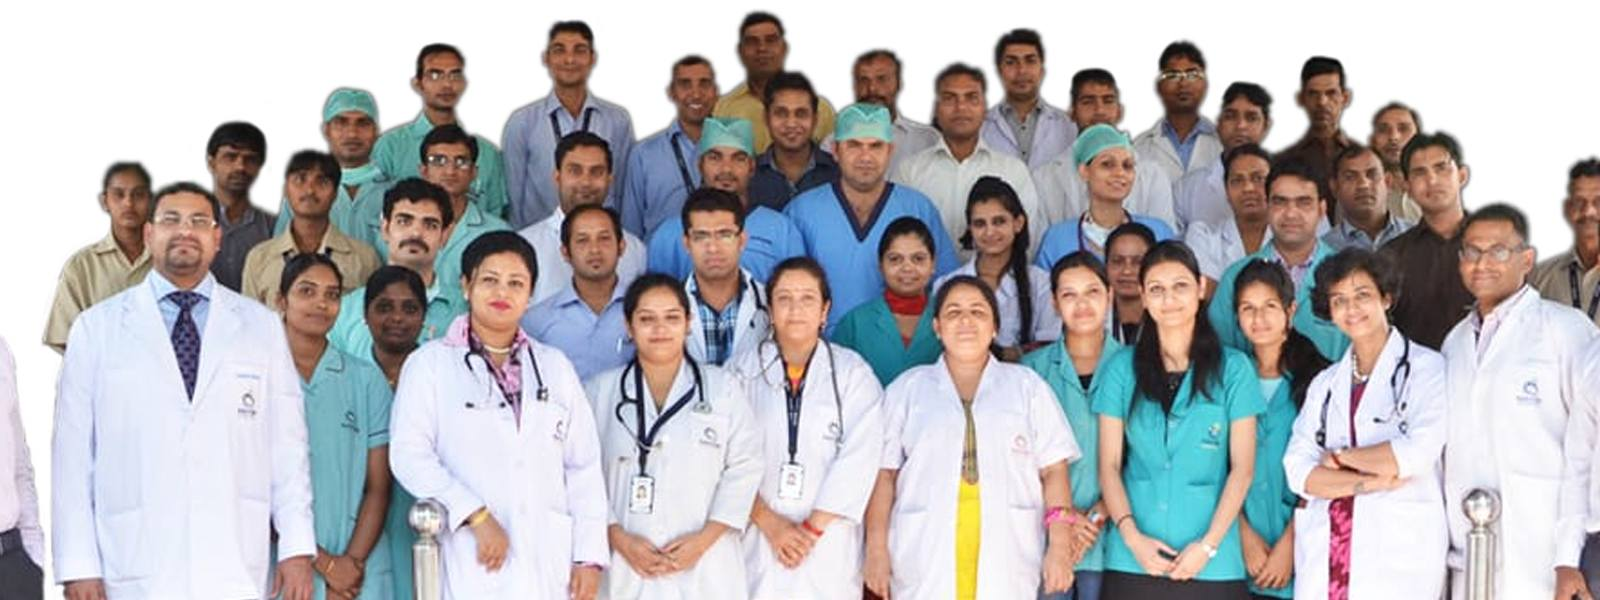 Mayom Hospital - Best Hospital in Gurgaon for Medical Healthcare